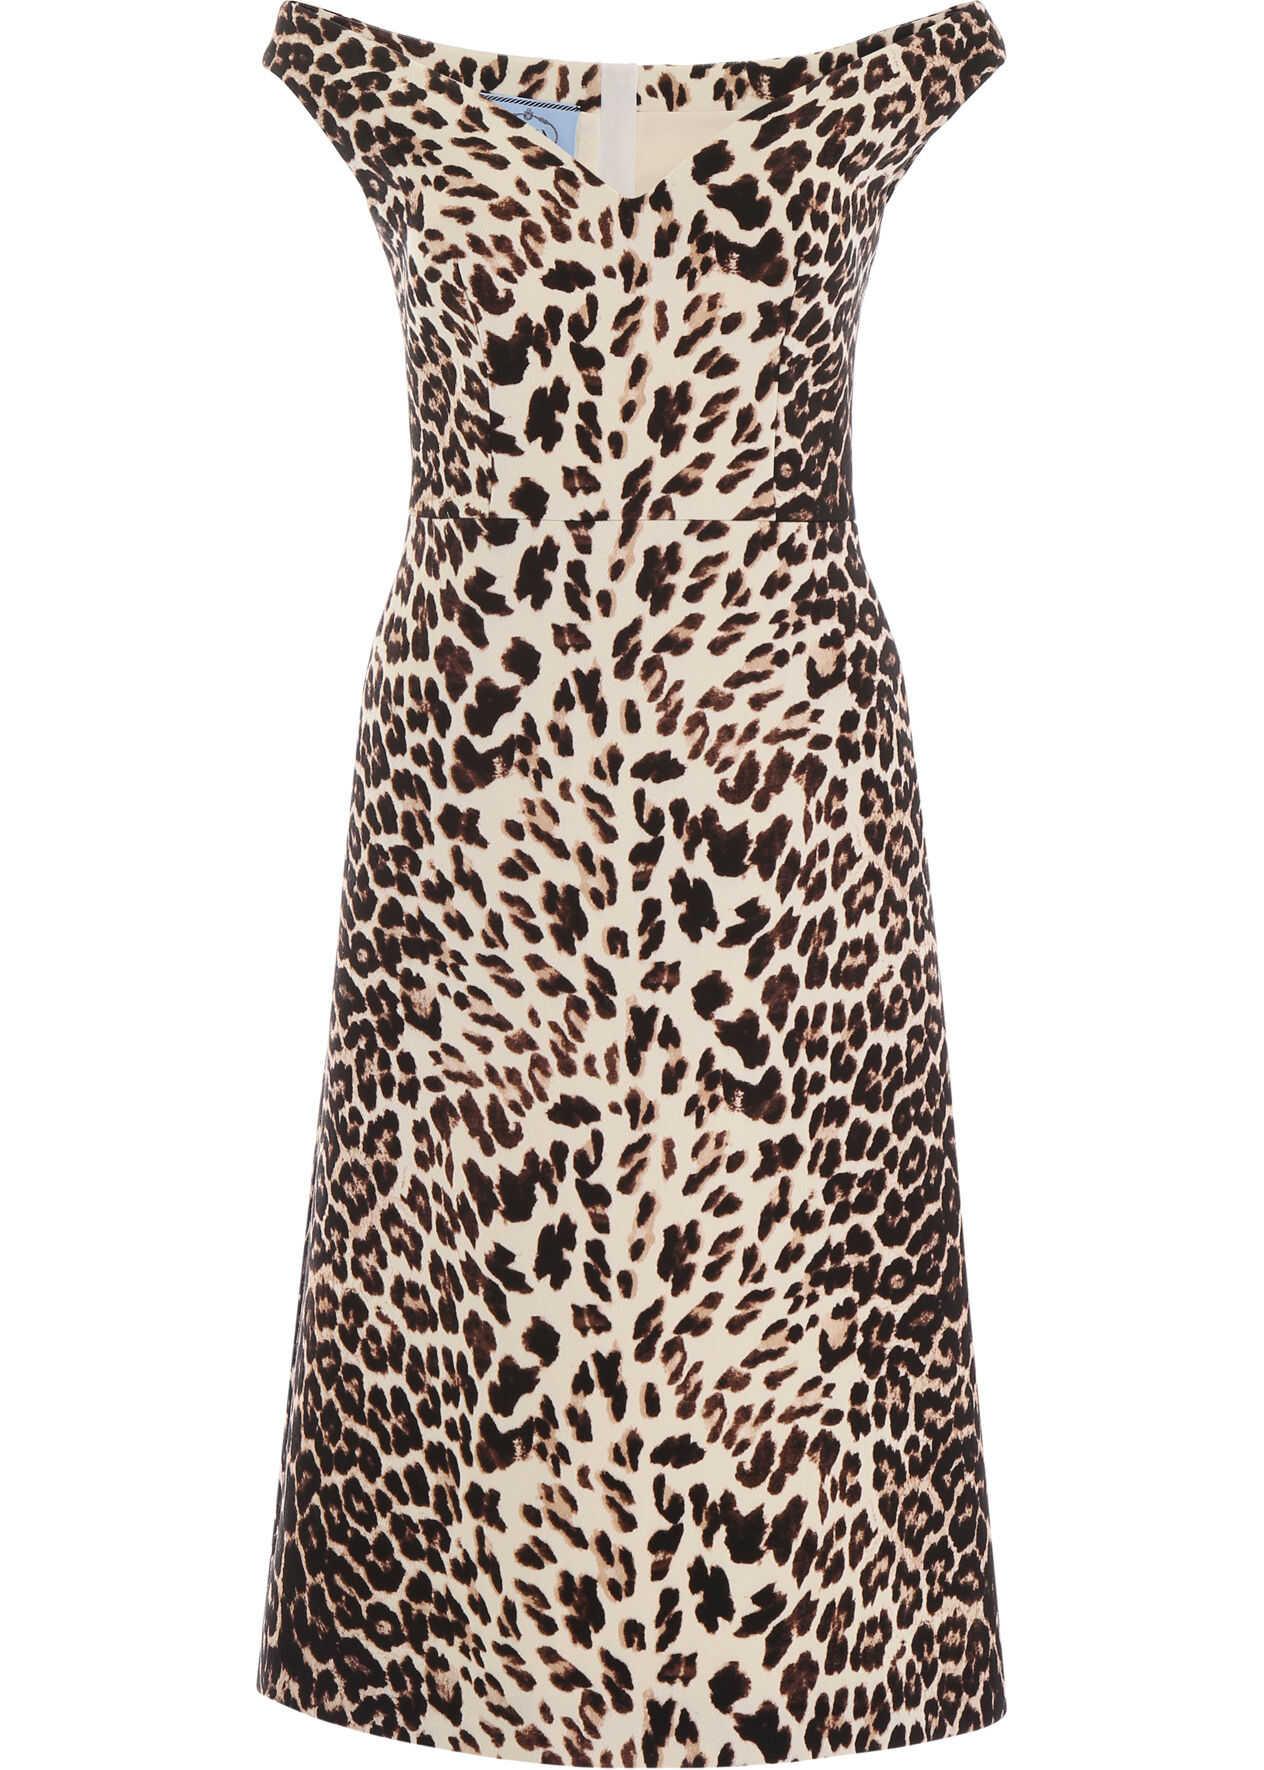 Prada Animalier Dress ALBINO